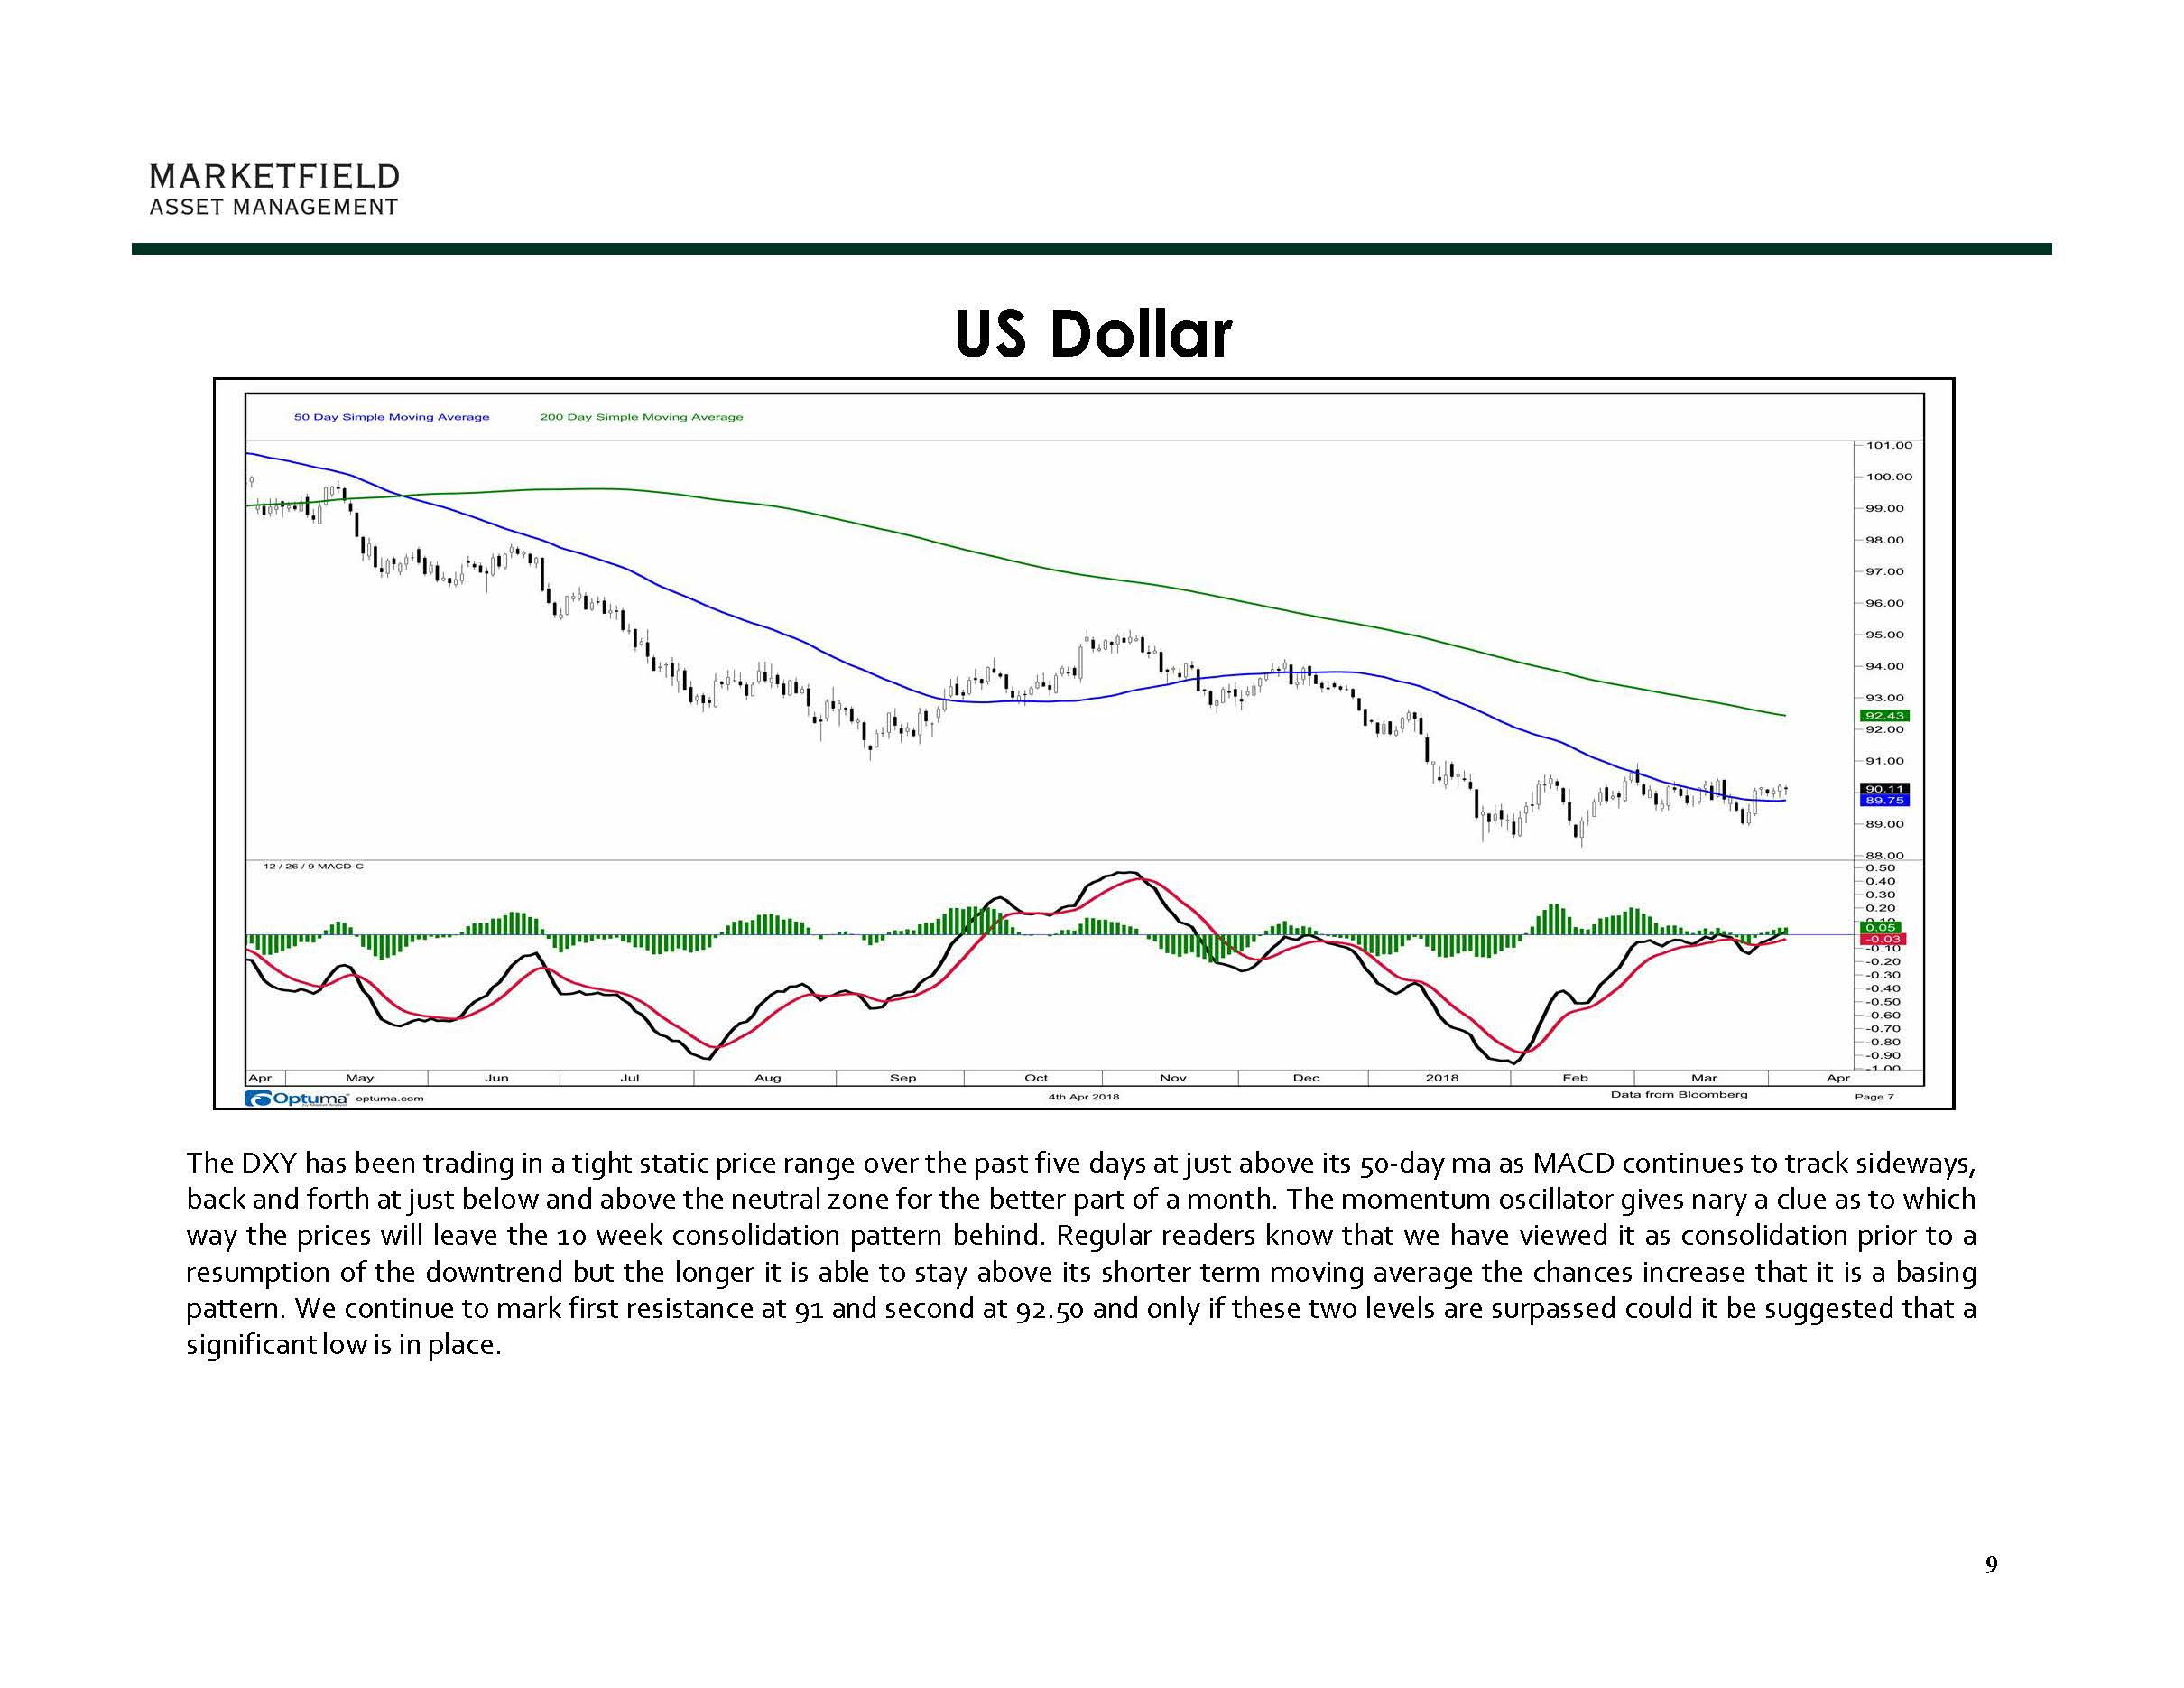 April 5_Marketfield Weekly Speculator_Page_10.jpg